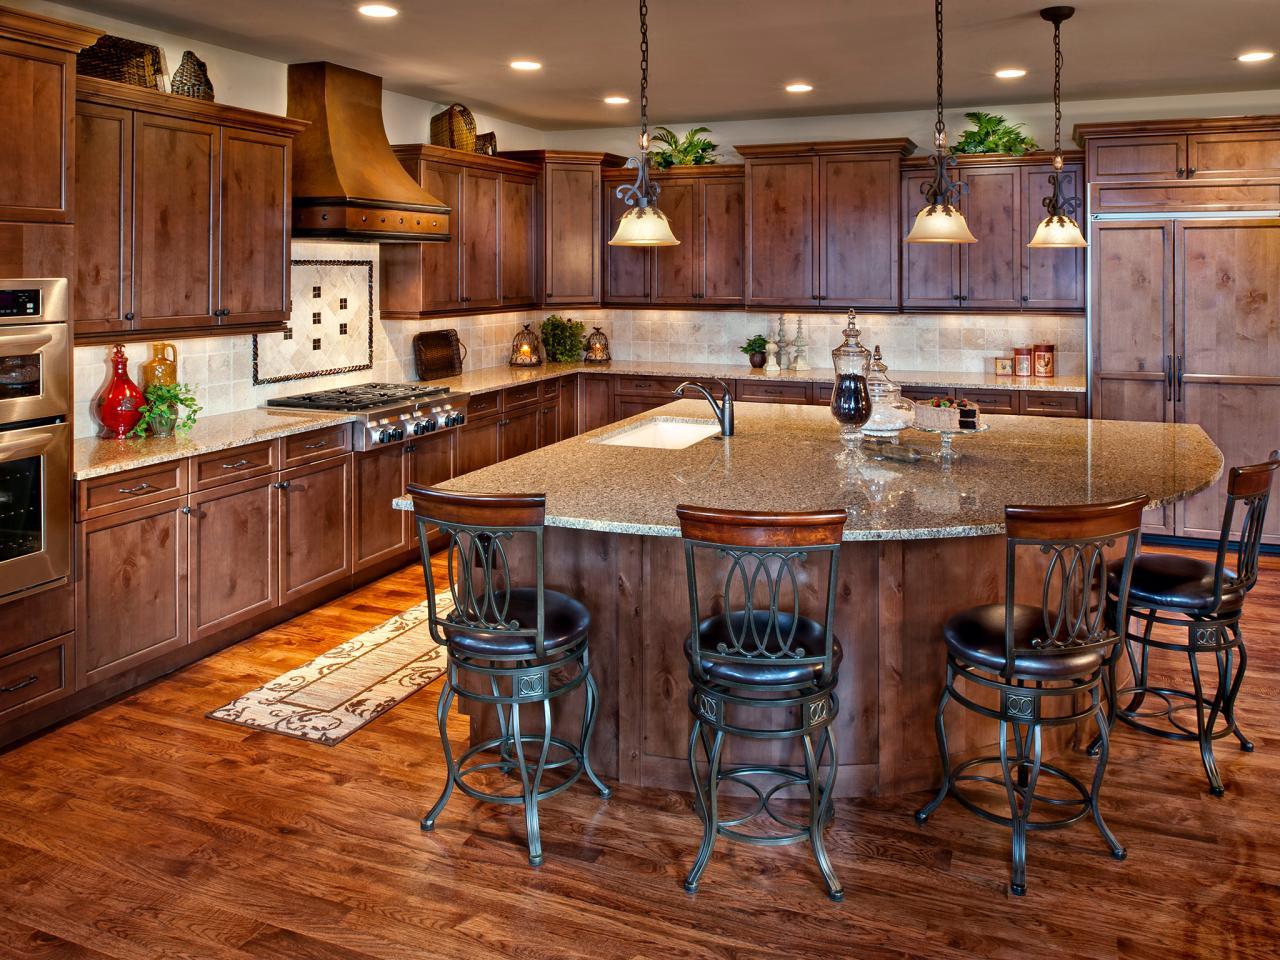 cottage kitchen cabinets - Old World Kitchen Cabinets